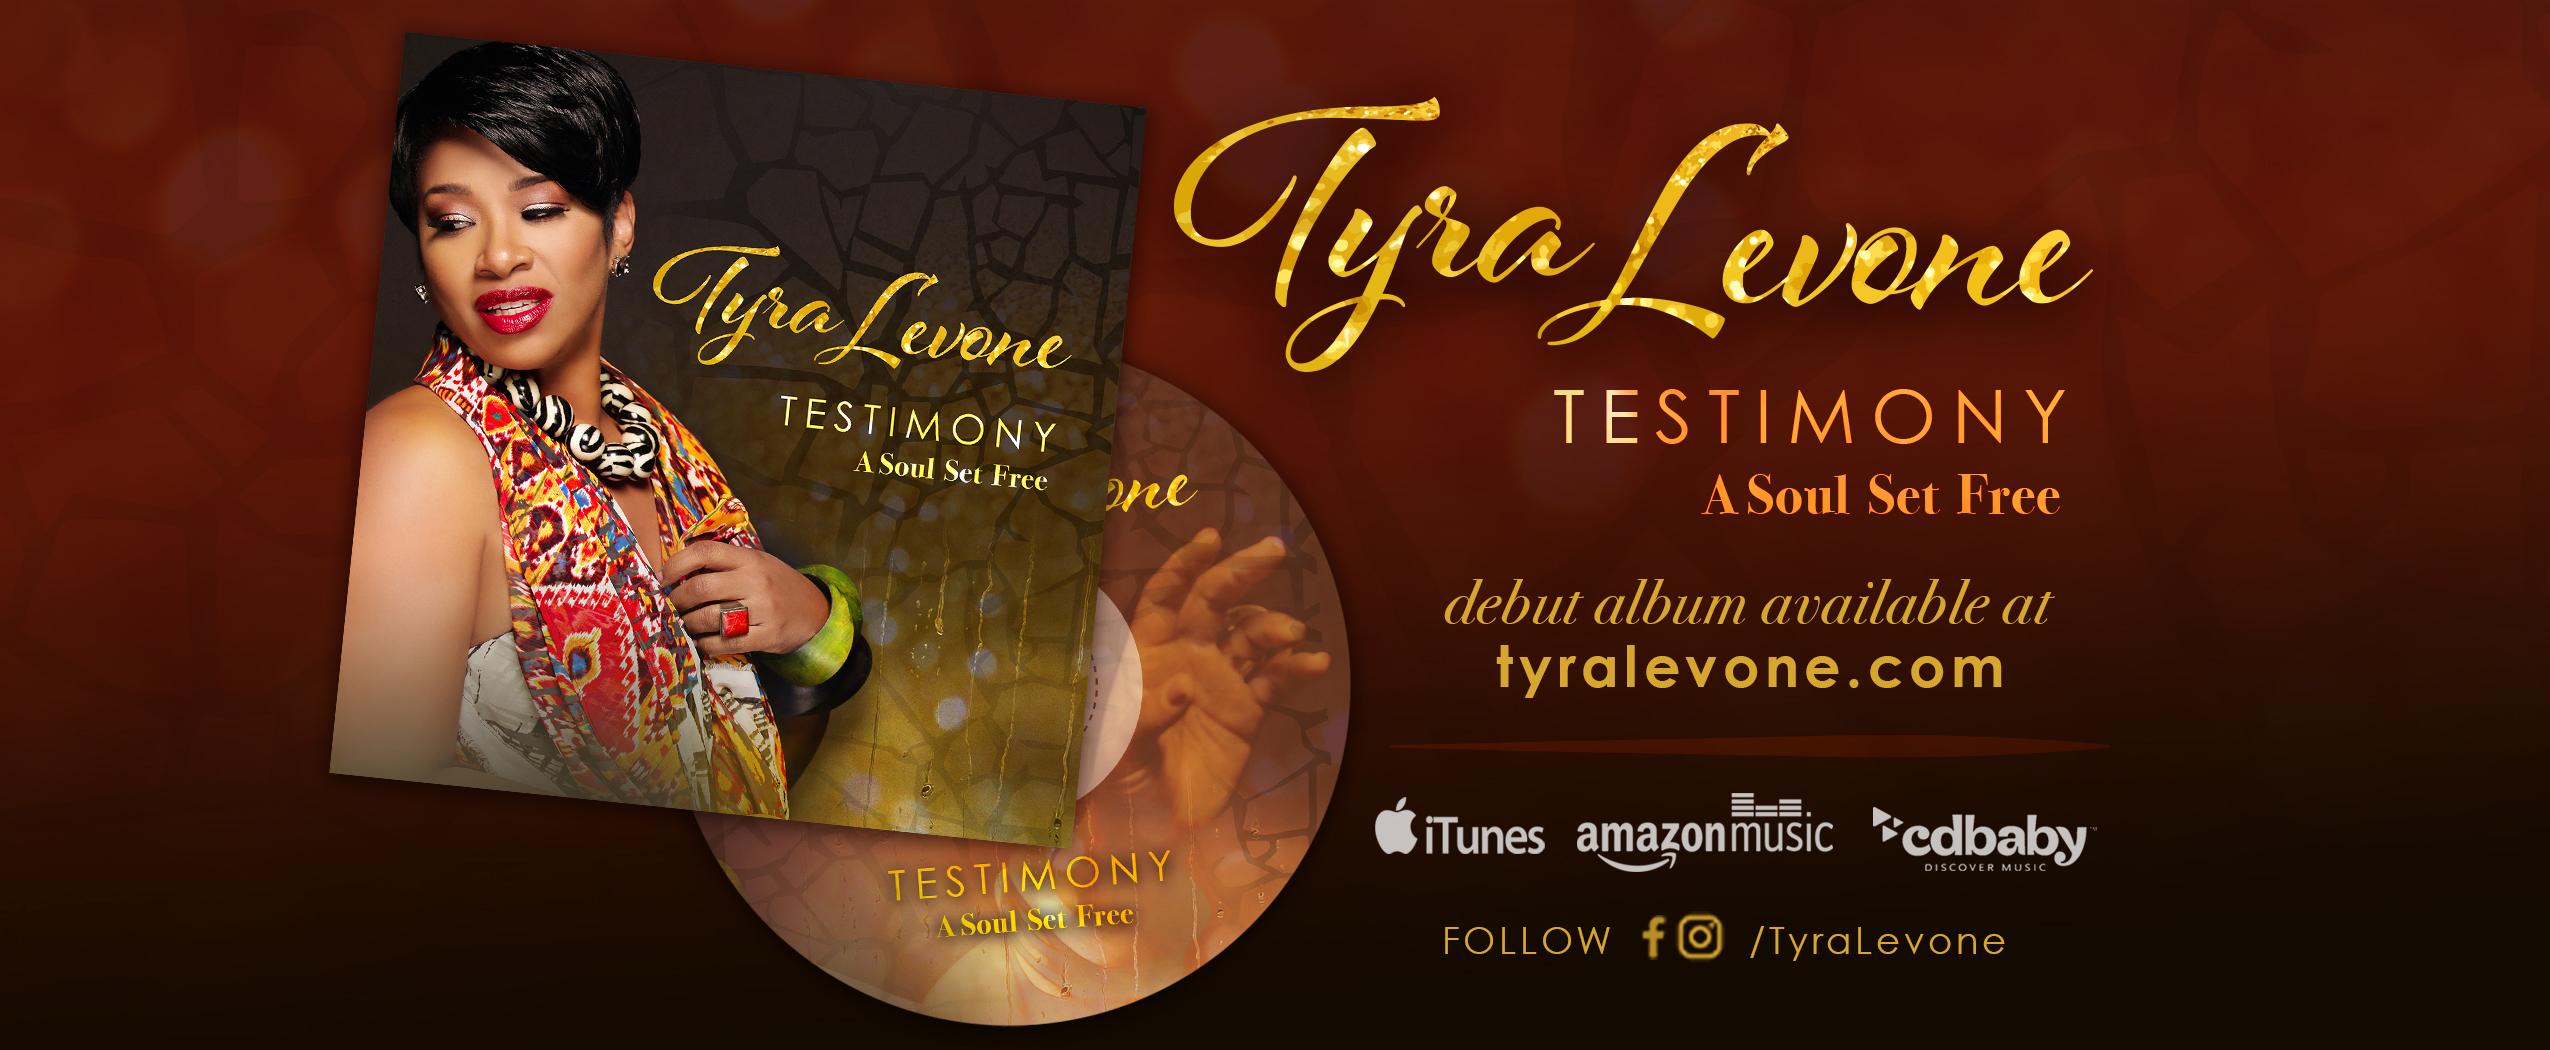 Tyra Levone Testimony Album Horizontal WEB